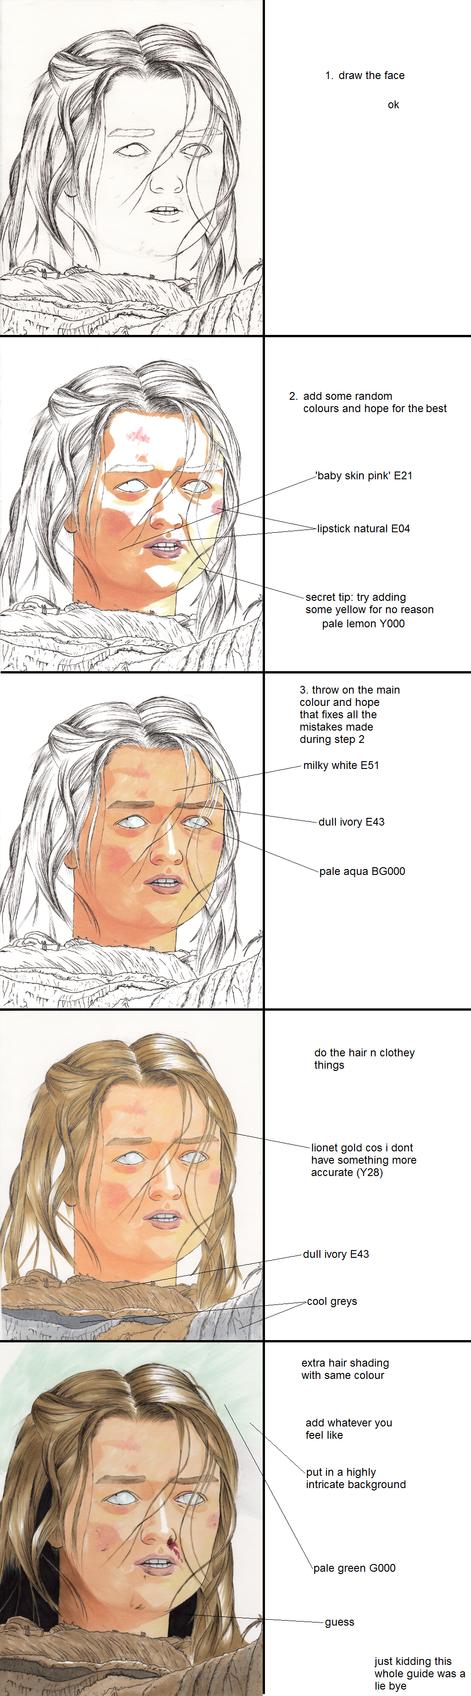 Copic process by Zalfurius